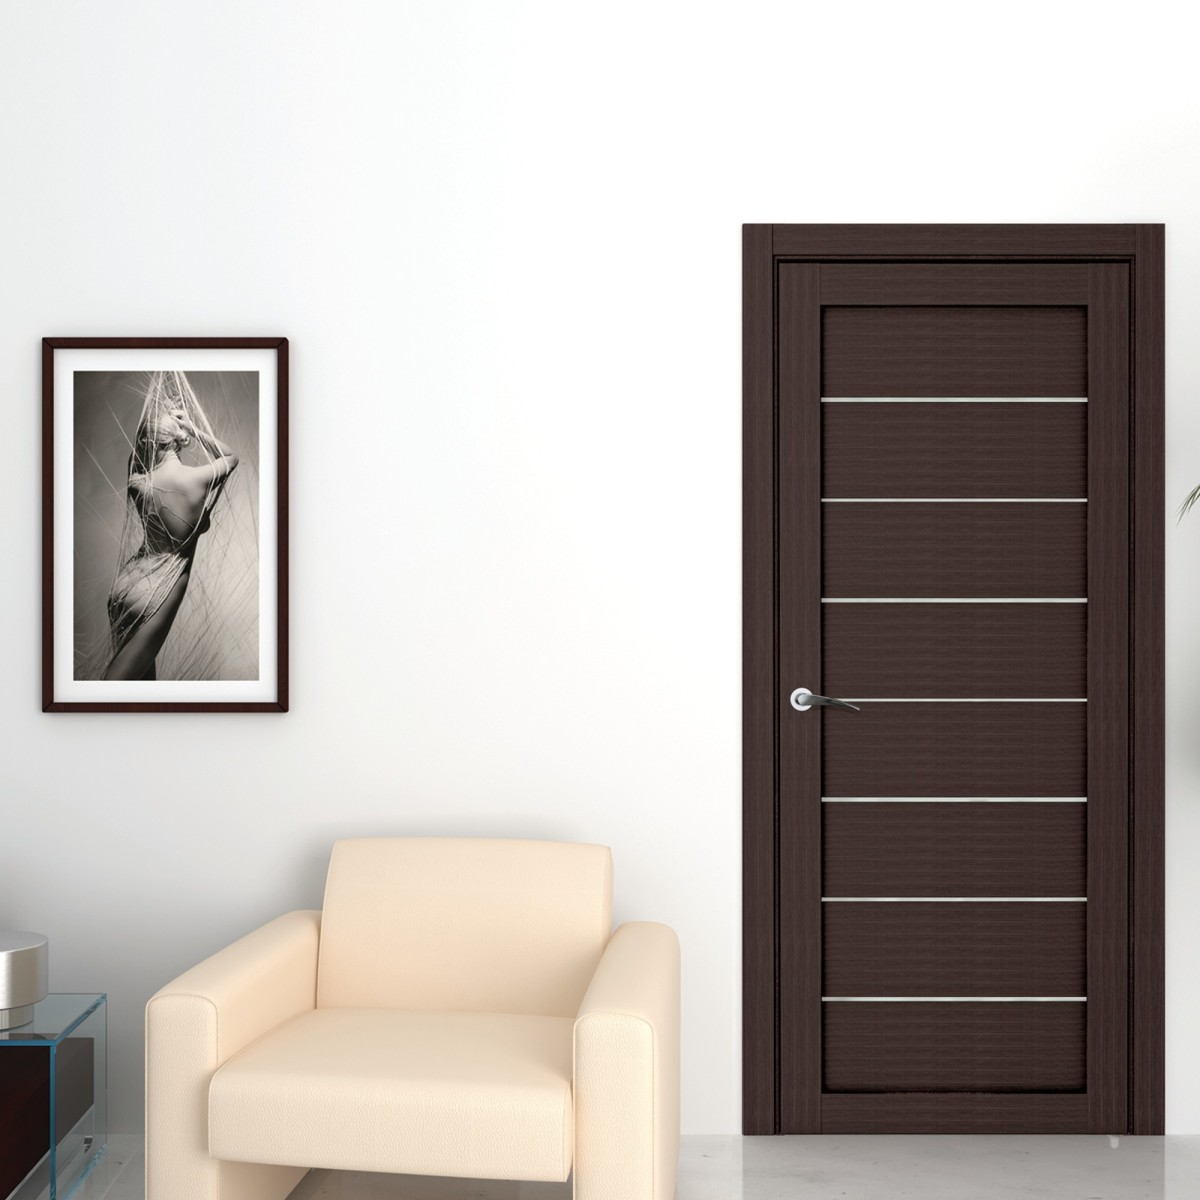 Дверь Межкомнатная Глухая Сабрина 55x190 Ламинация Цвет Мокко С Фурнитурой